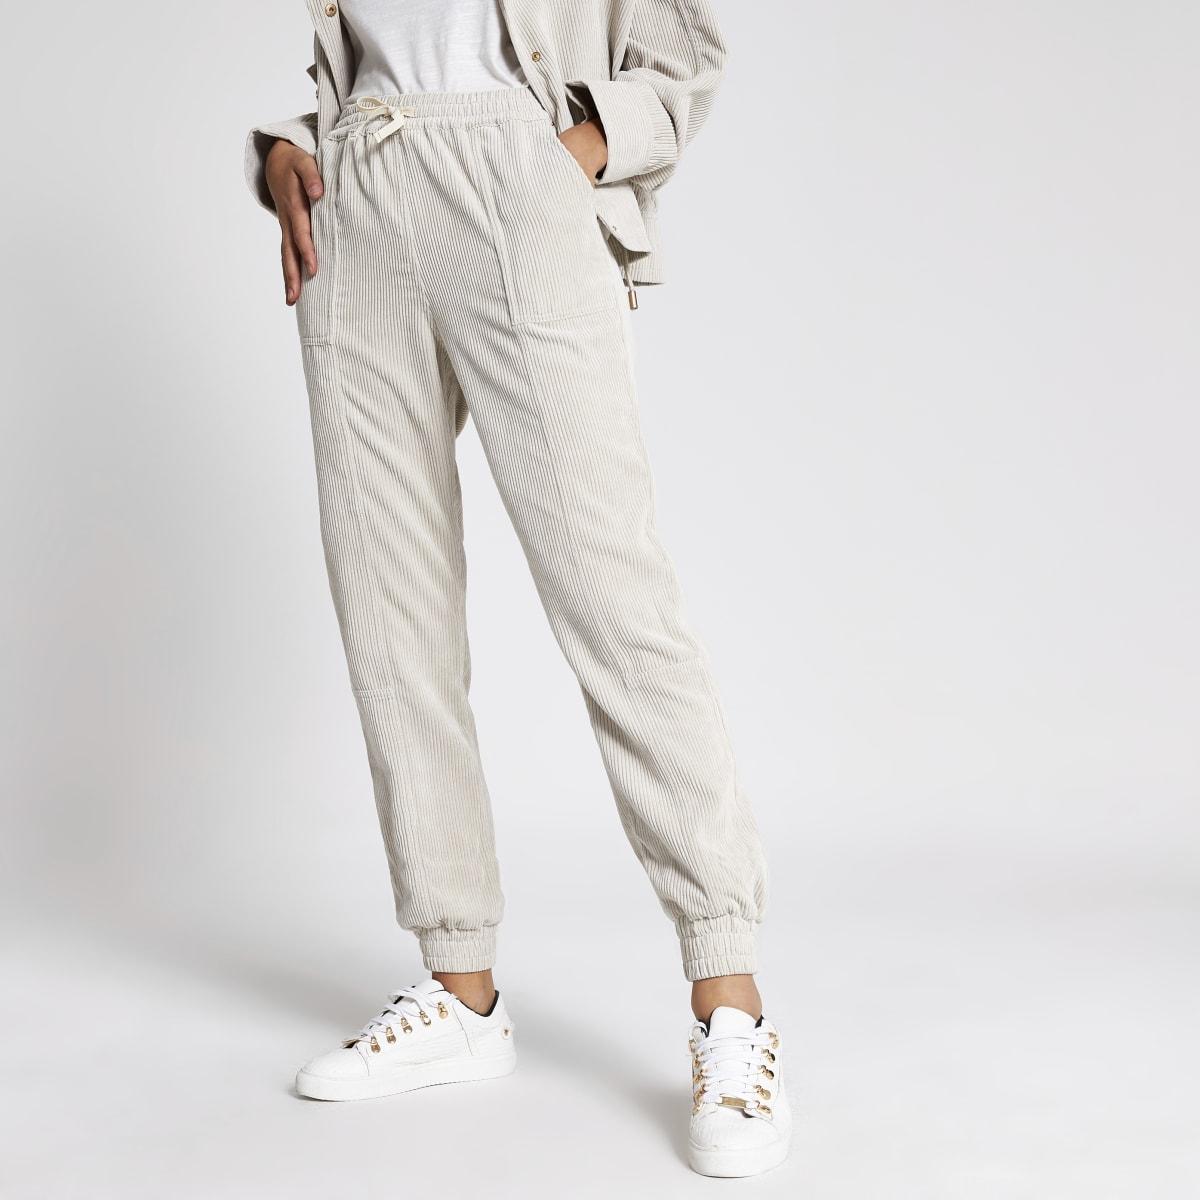 Cream corduroy jogger trousers